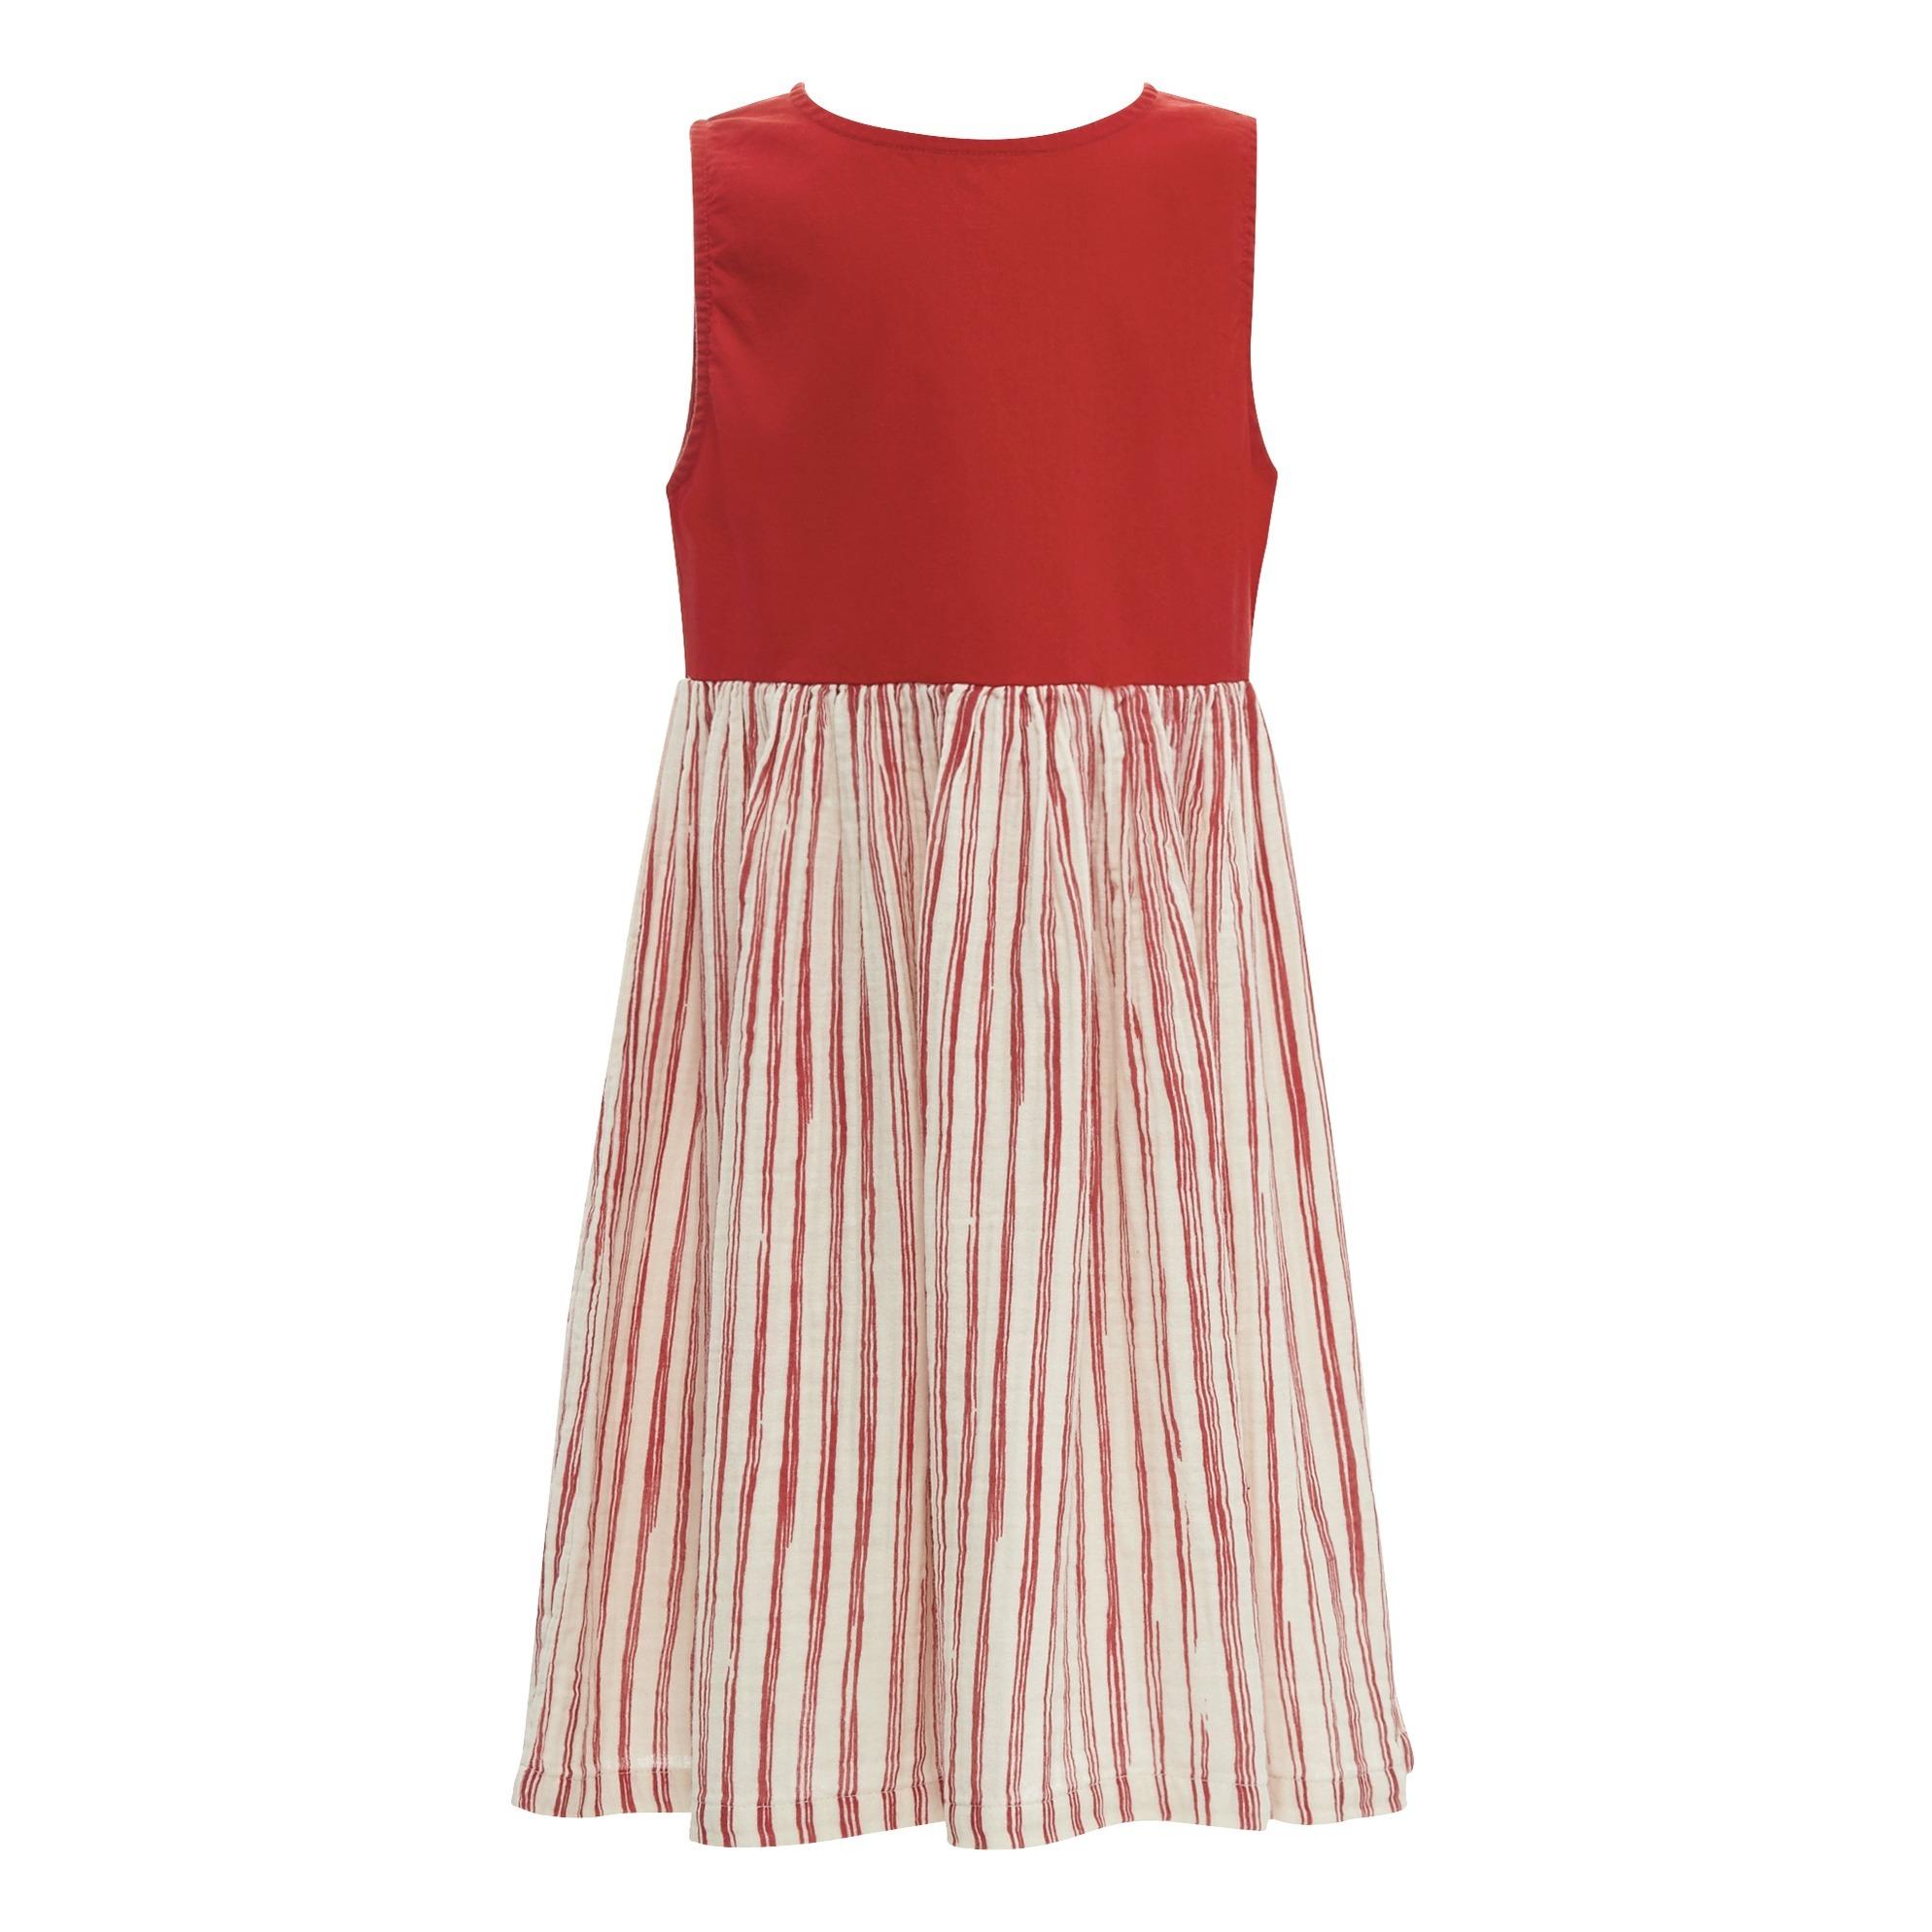 9e95888ec Kids Clothing ⋅ Kids Fashion ⋅ Smallable